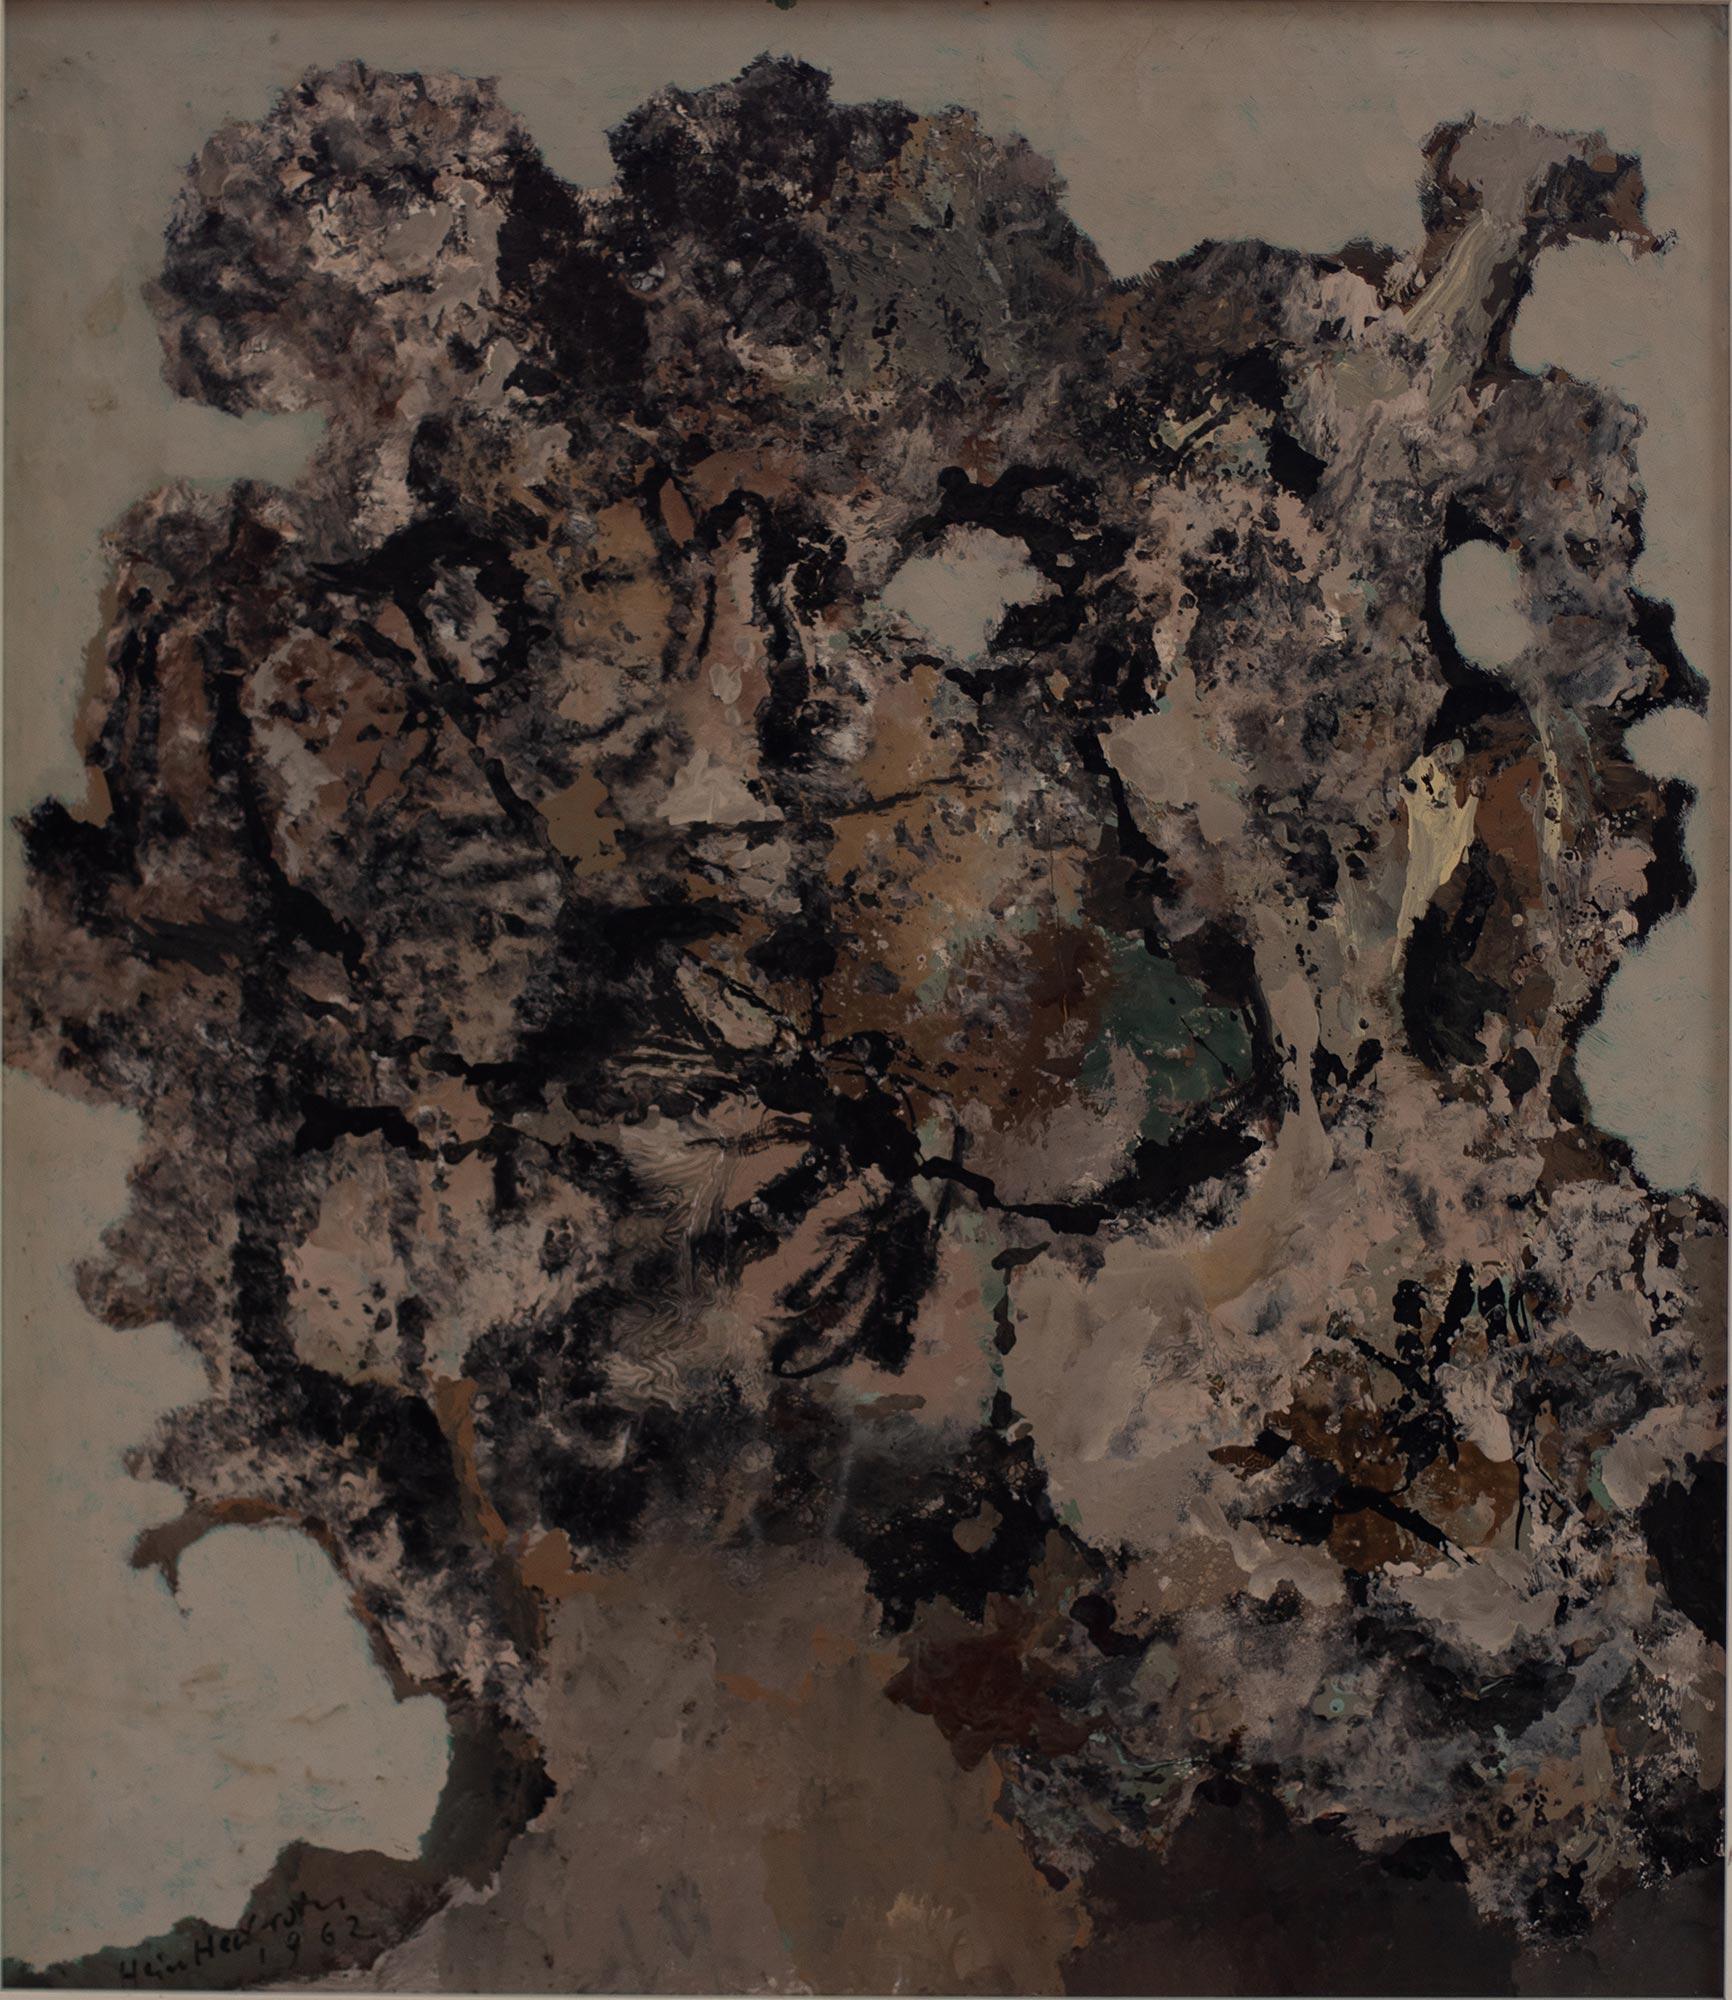 13 Hein Heckroth, o. T., 1962, Öl auf Holz, 57 x 49,5 cm, Privatbesitz